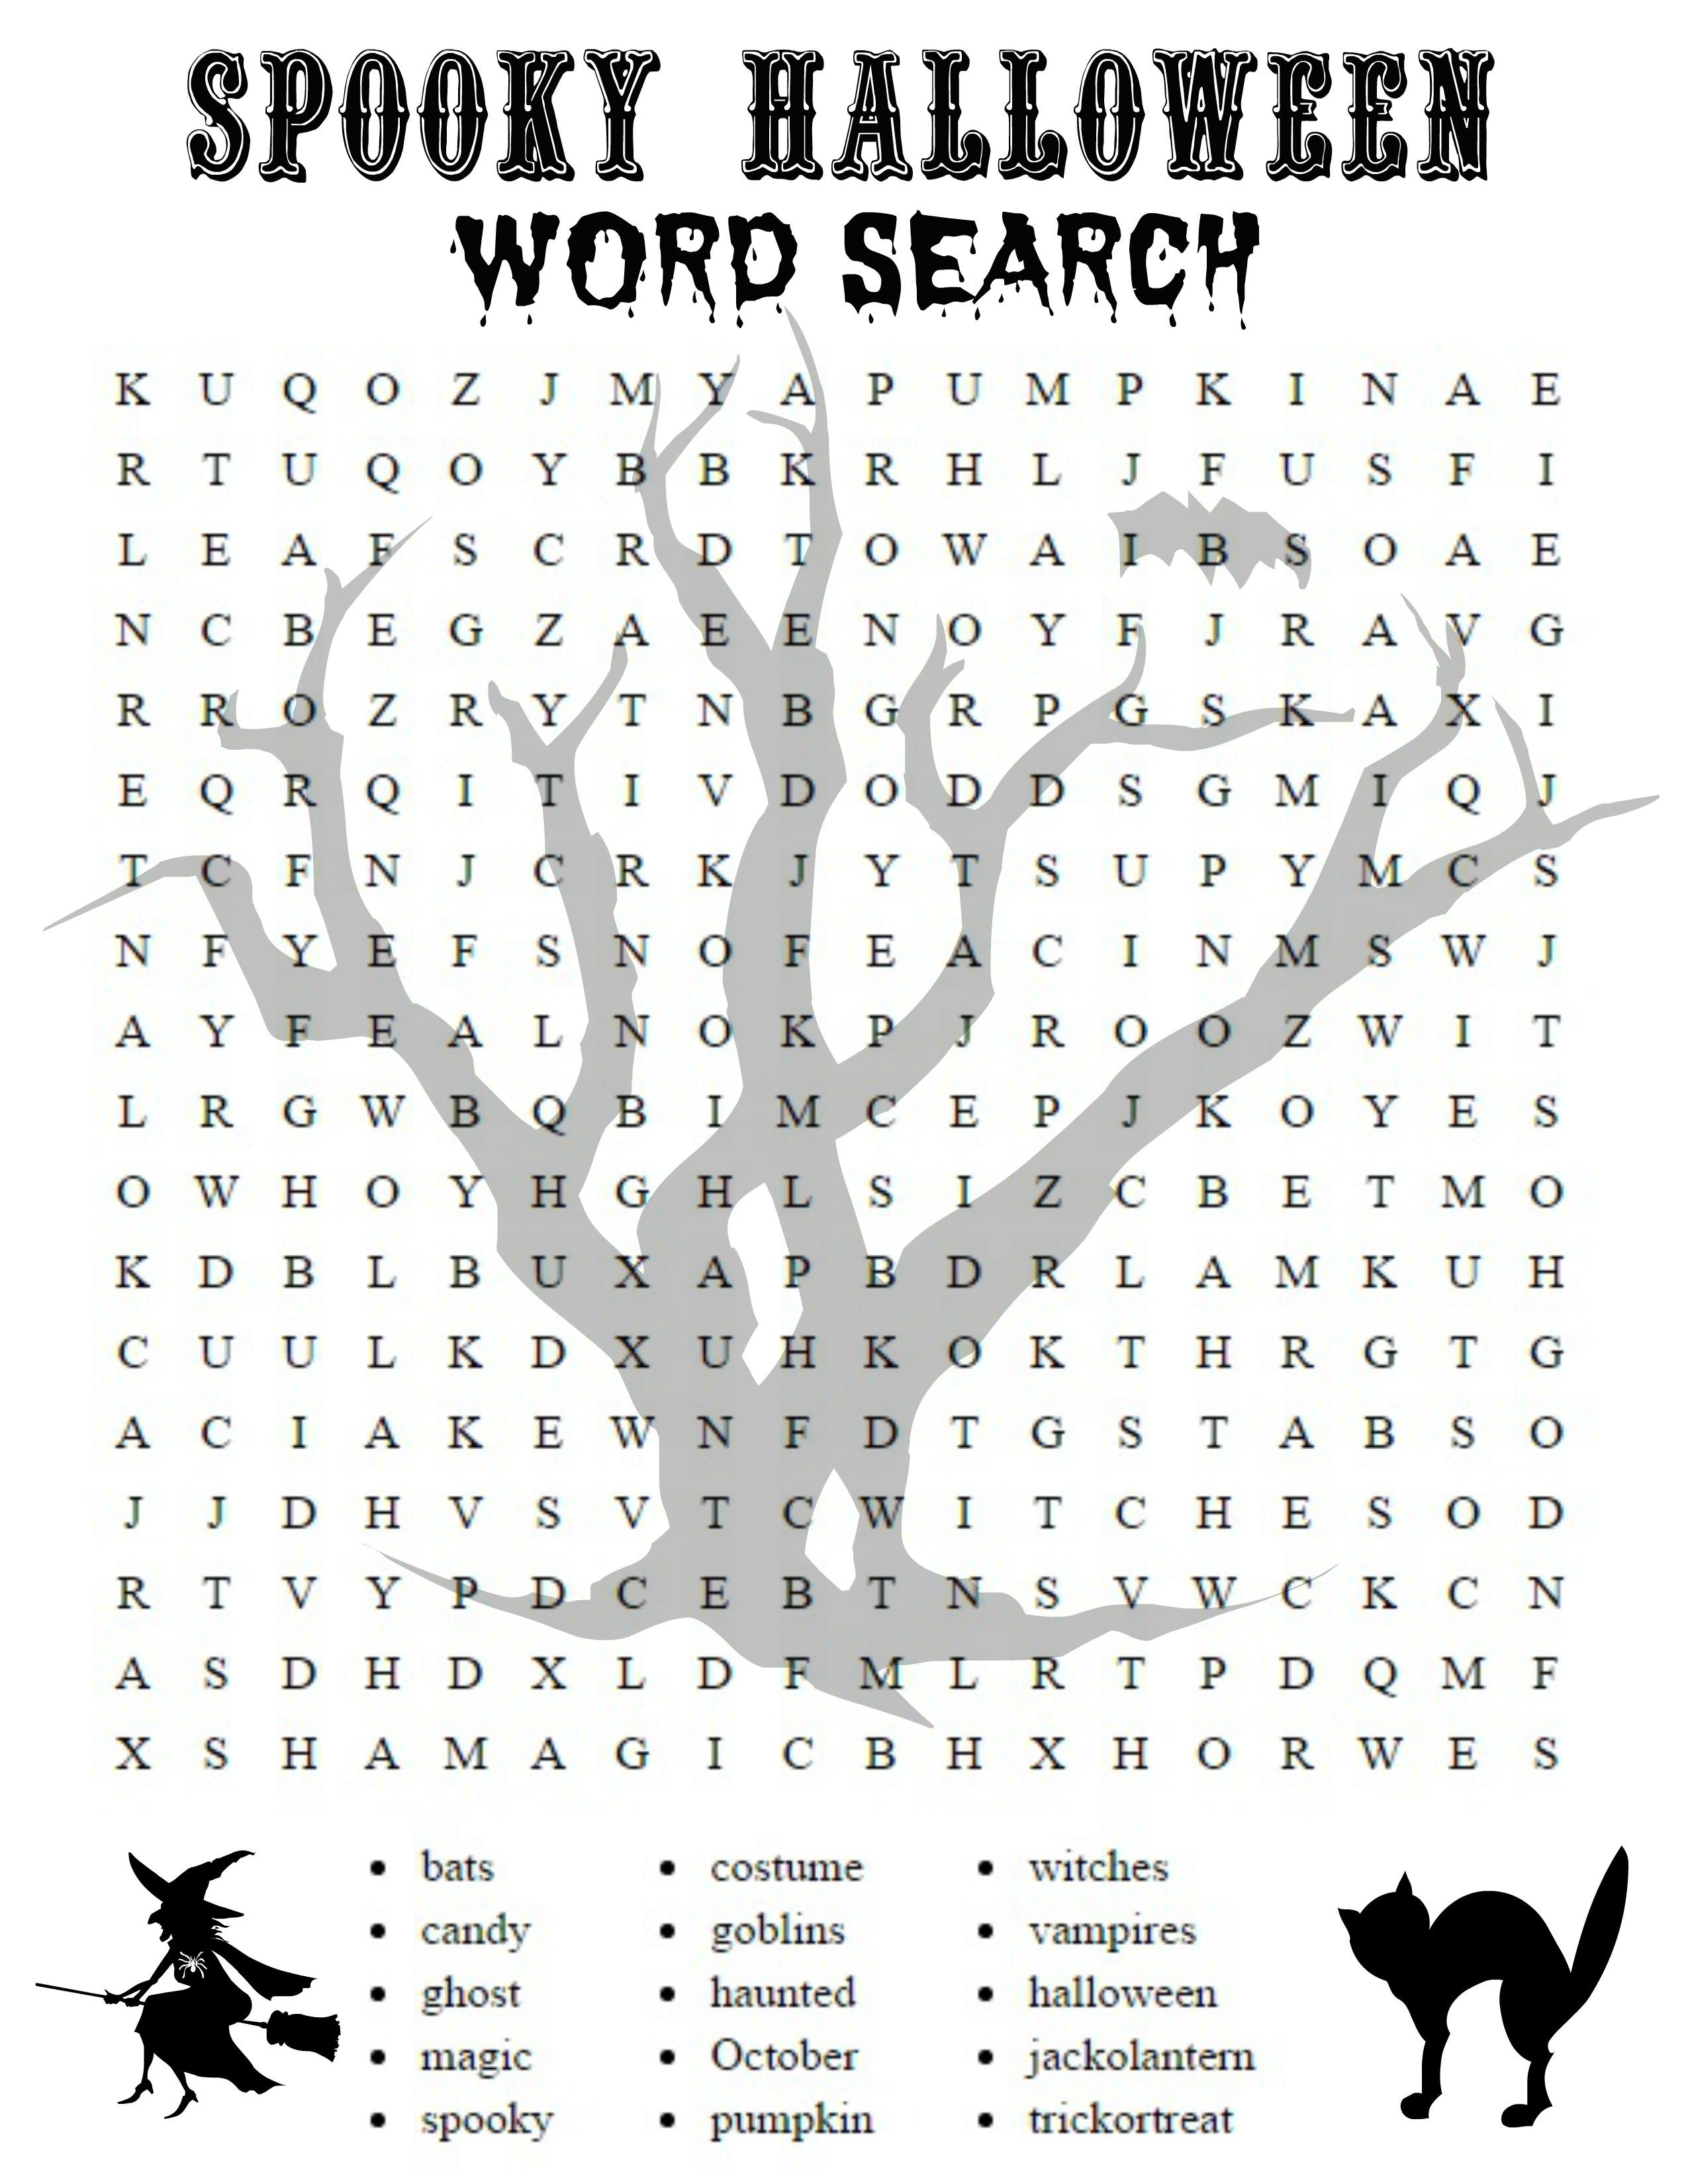 Free Printable Halloween Word Search Puzzles | Free Printables - Halloween Crossword Puzzles For Adults Printable